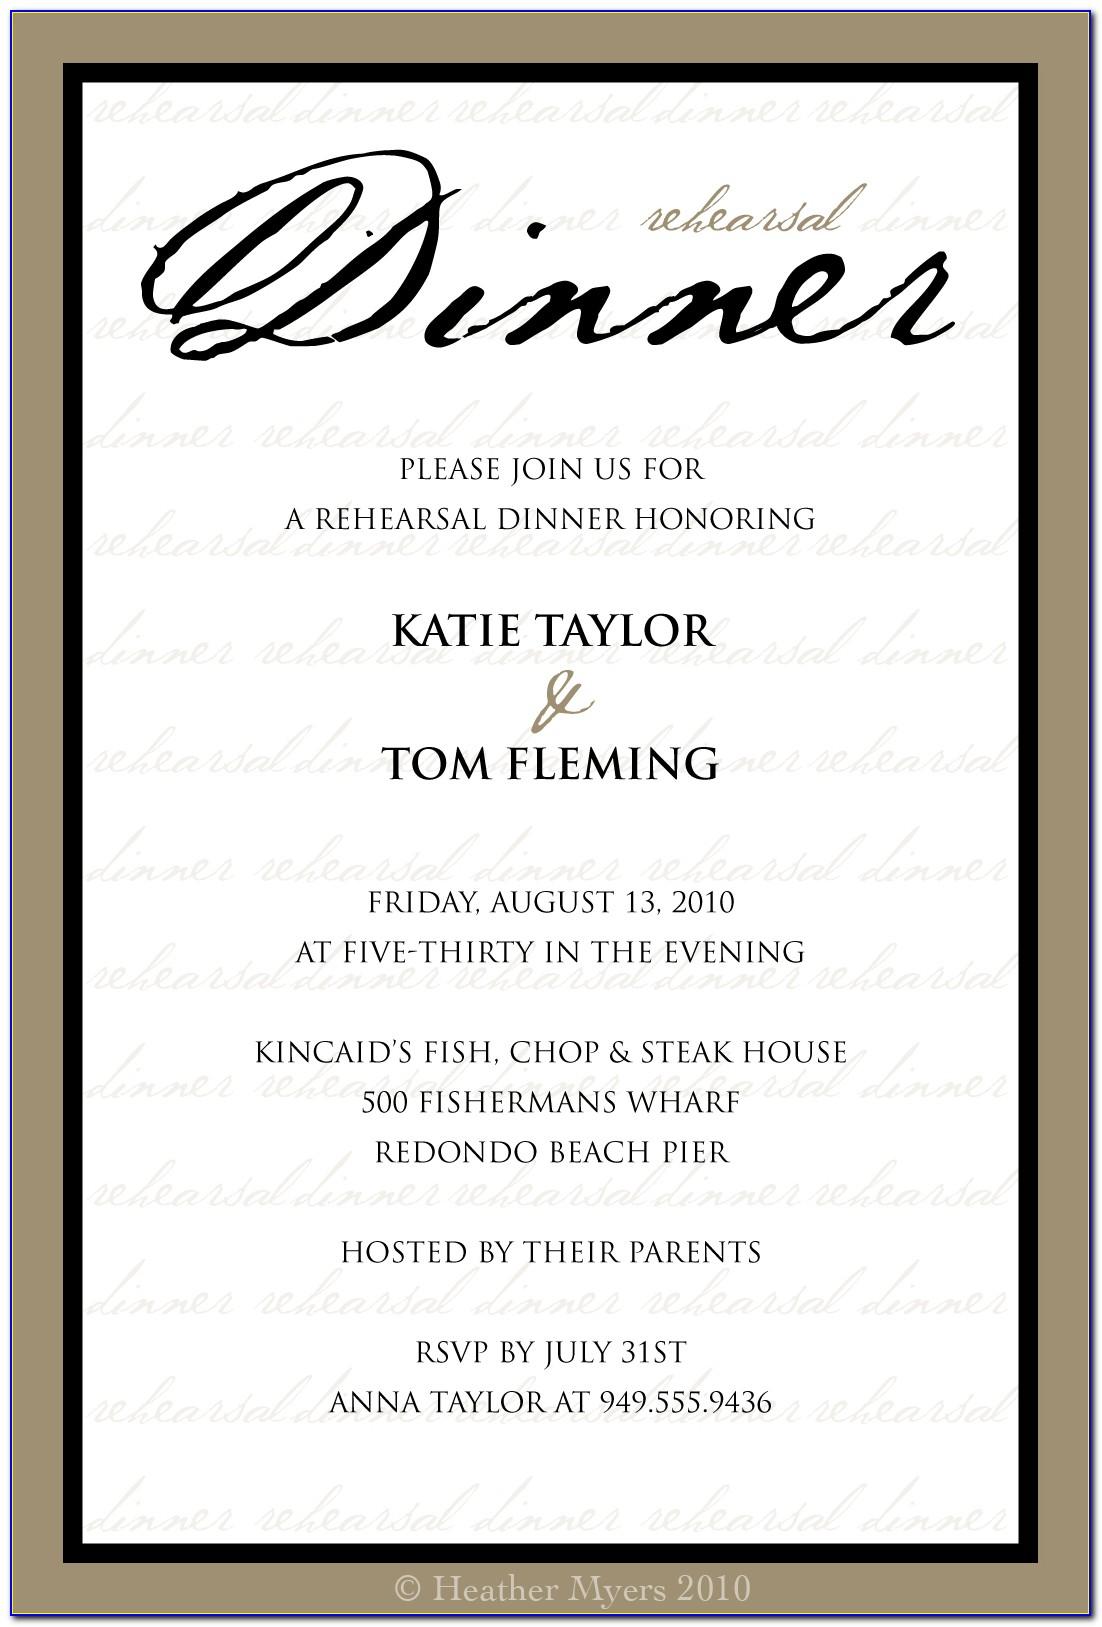 Business Dinner Invitation Template Free